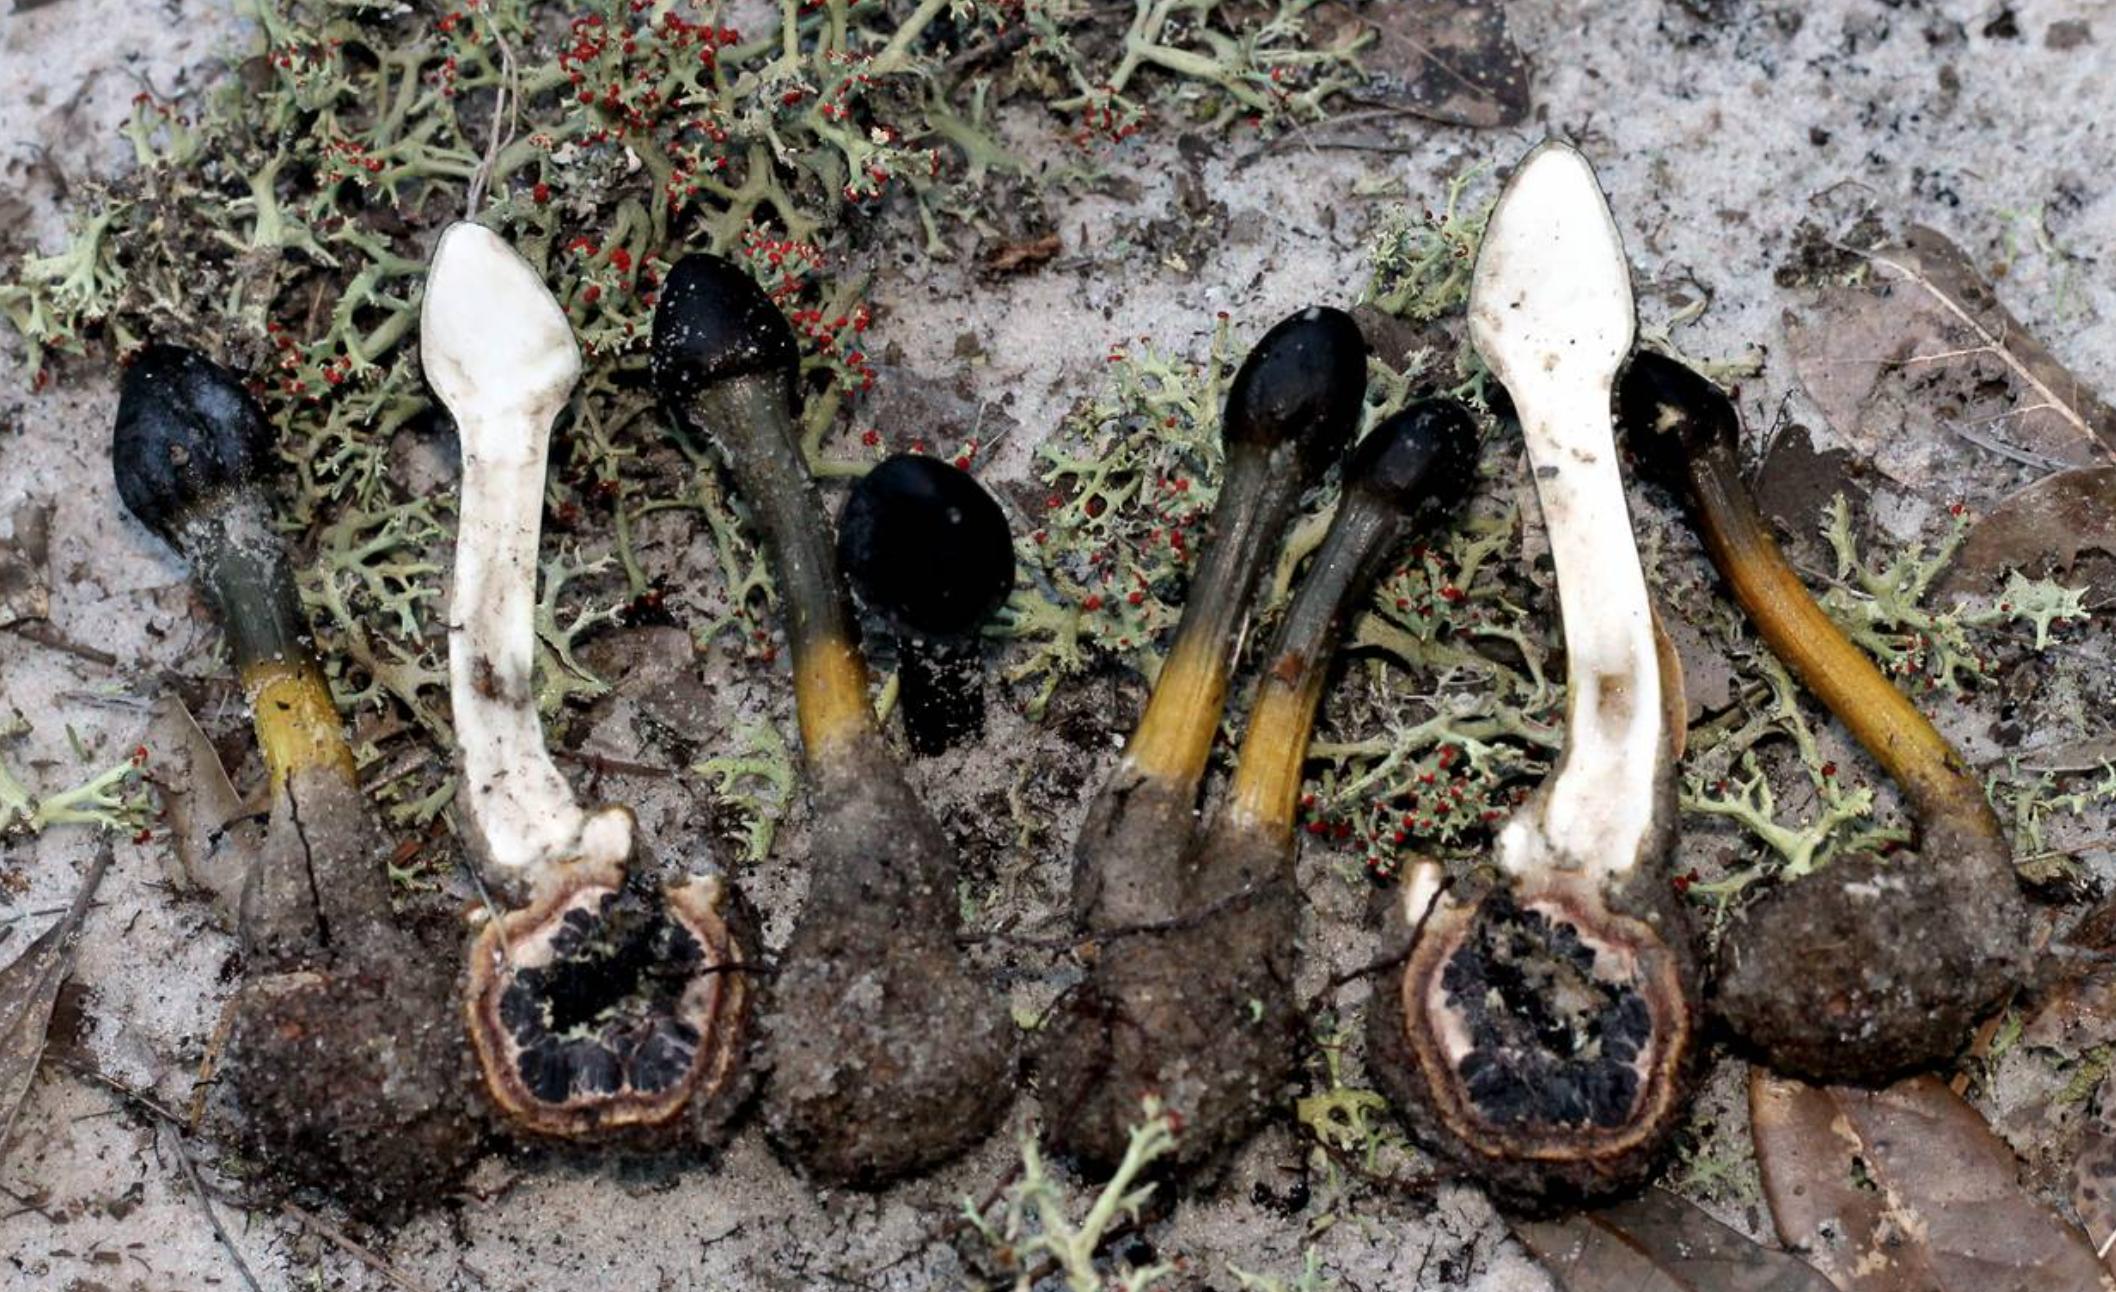 Cross section of the myco parasite  Elaphocordyceps capitata  and its unfortunate host  Elaphomyces muricatus . By  Richard Kneal .